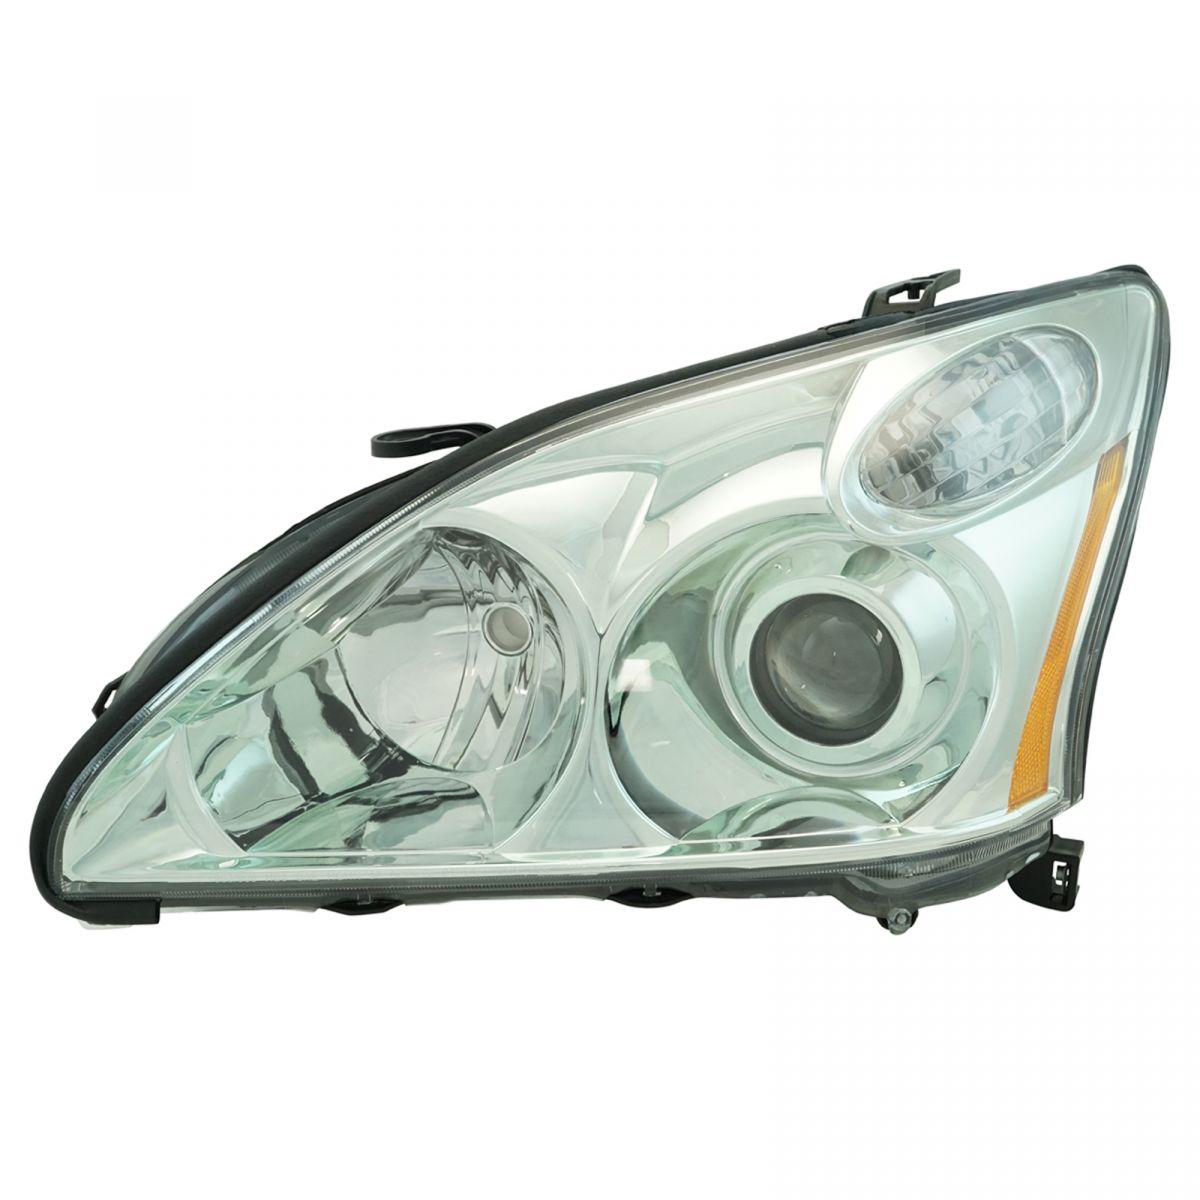 04-06 Scion XB Headlight Headlamp Halogen Front Head Light Lamp Left Driver Side